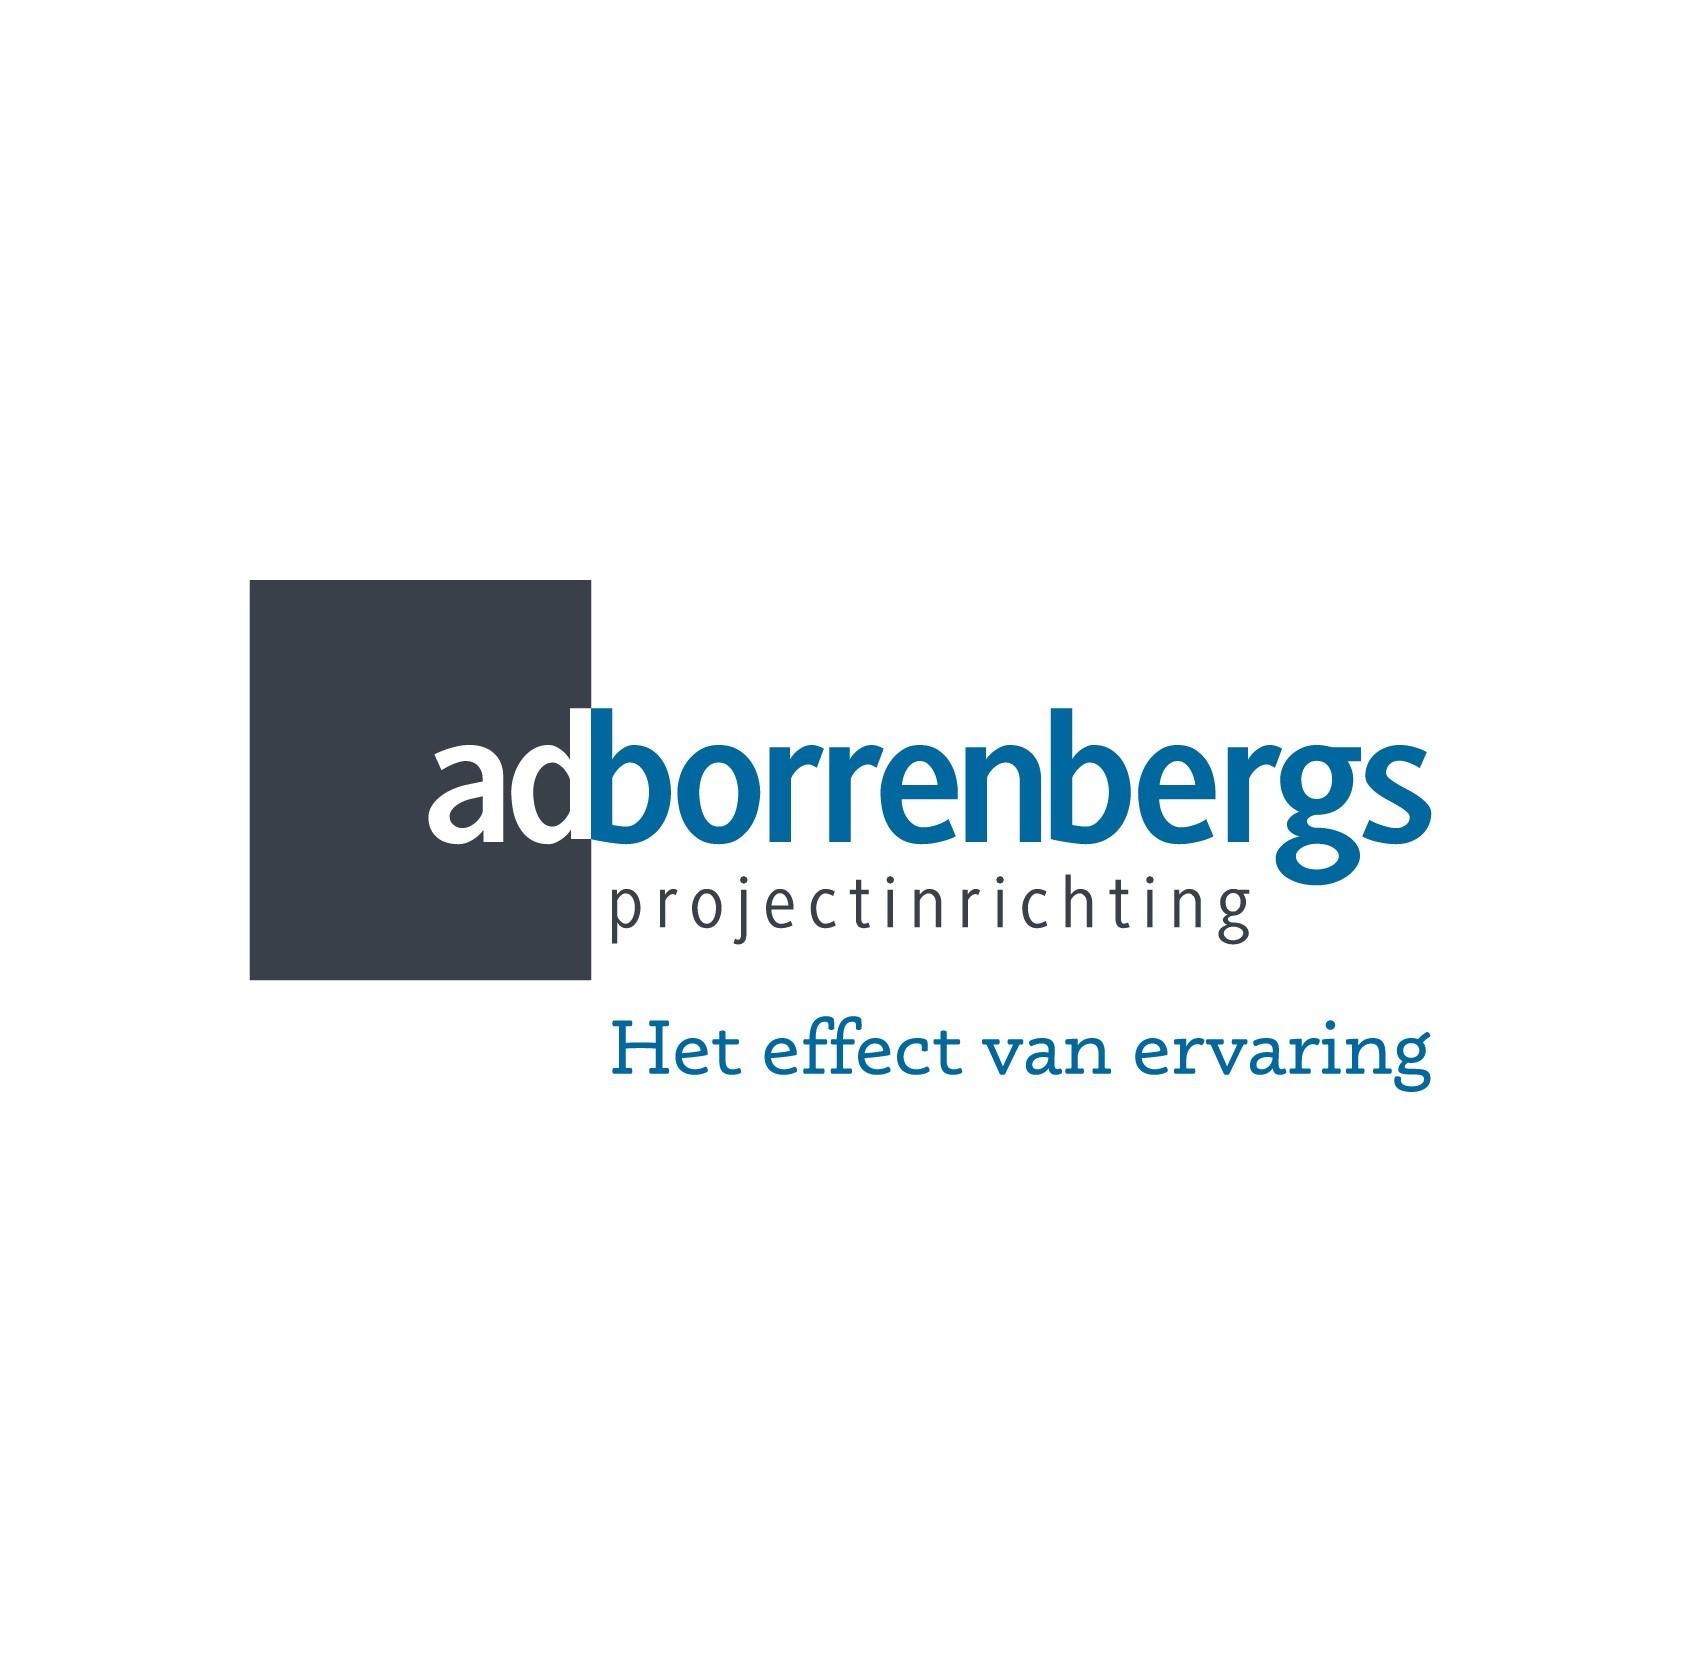 Borrenbergs Projectinrichting